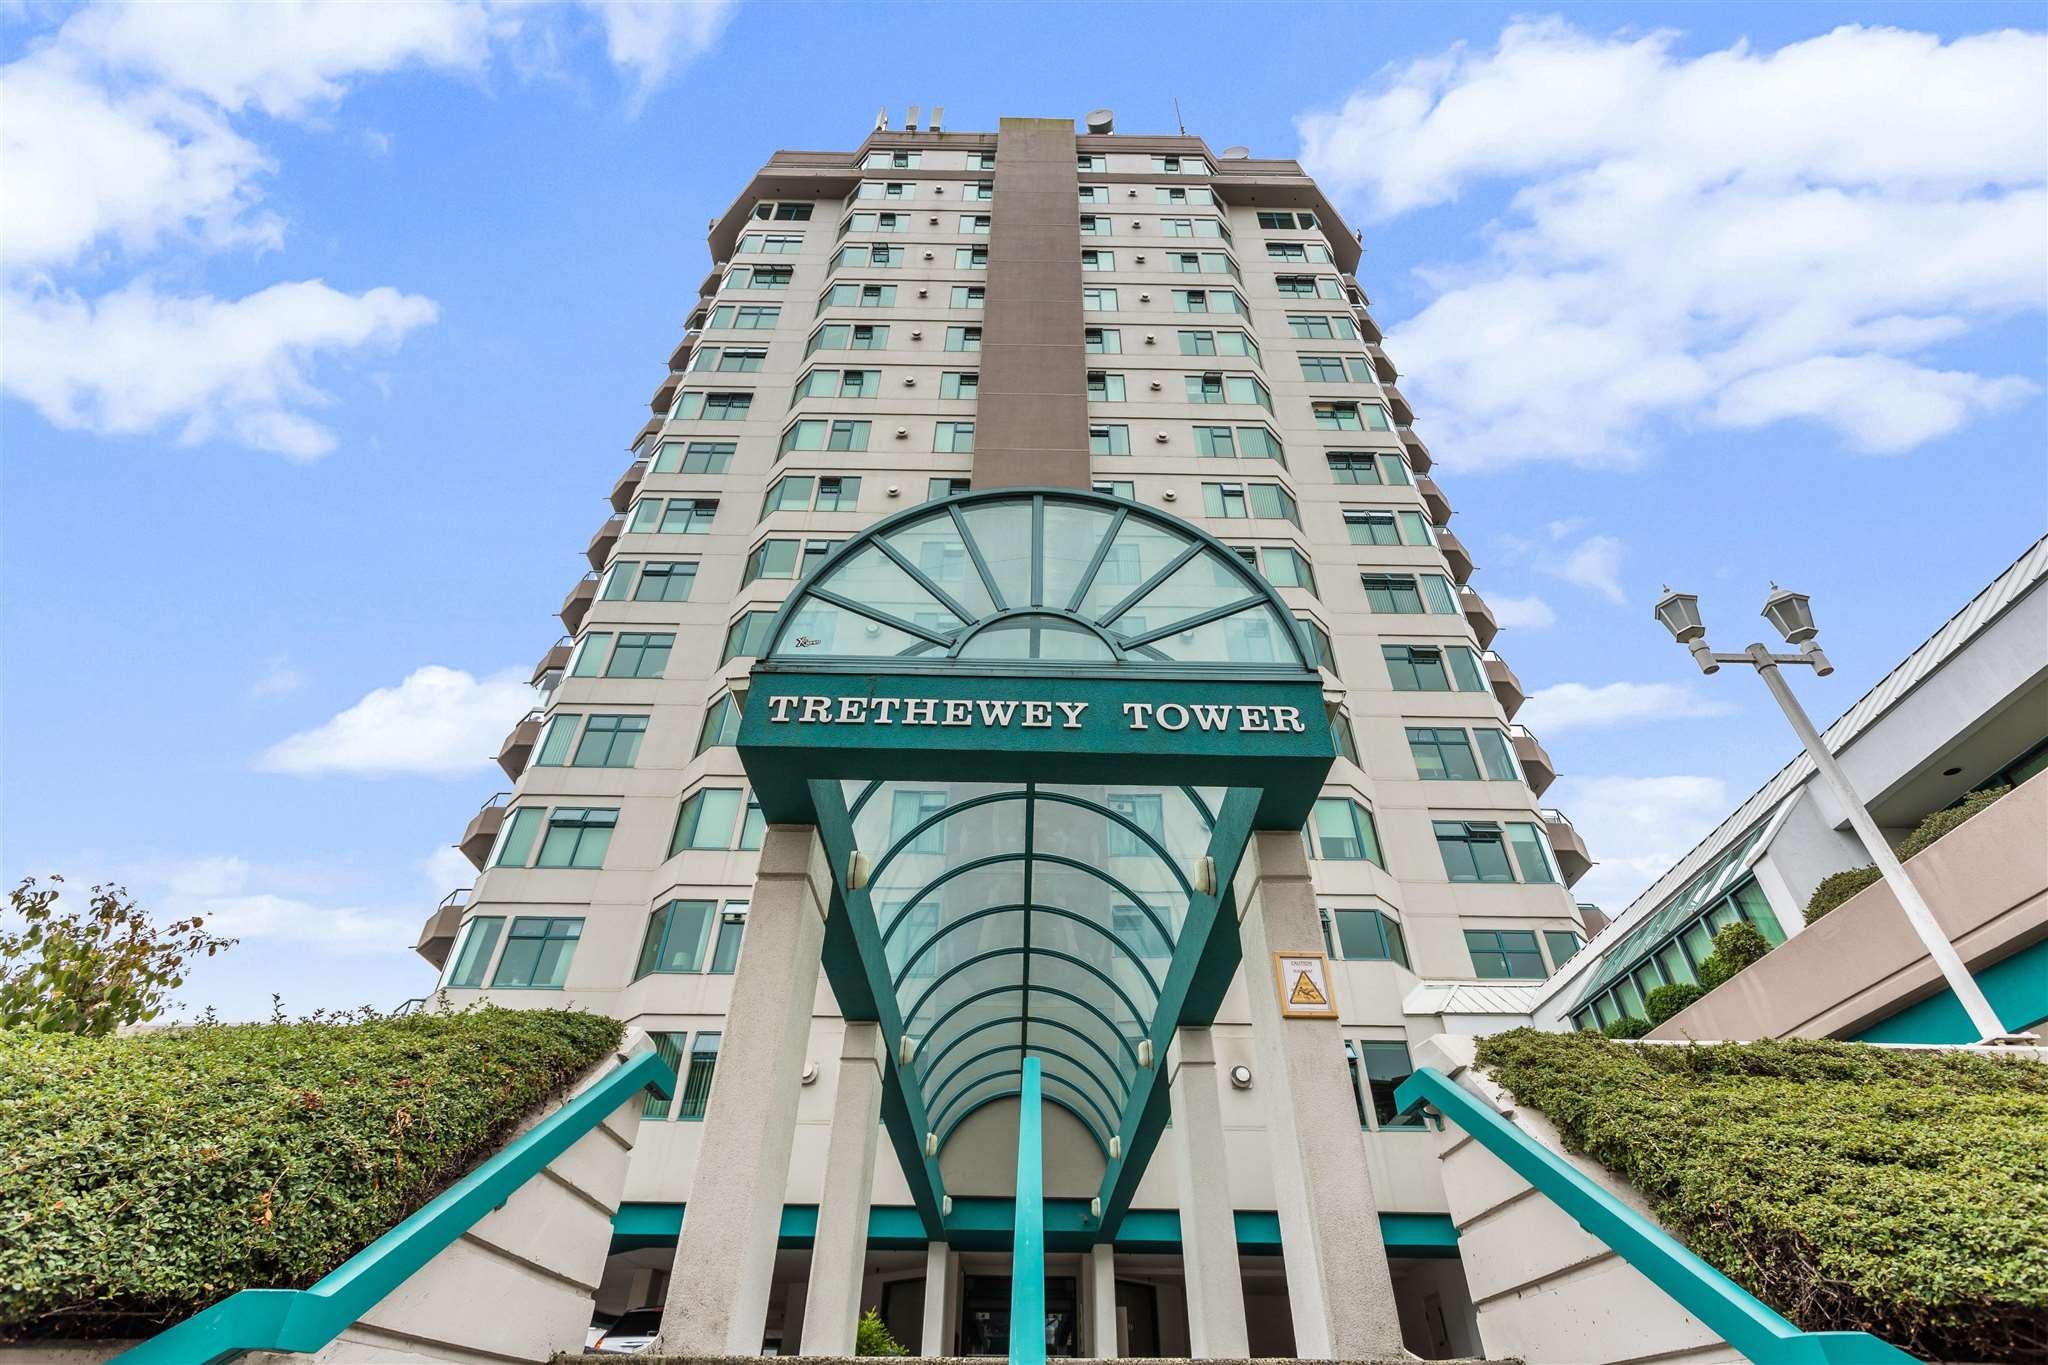 1201 32440 SIMON AVENUE - Abbotsford West Apartment/Condo for sale, 2 Bedrooms (R2600578) - #1